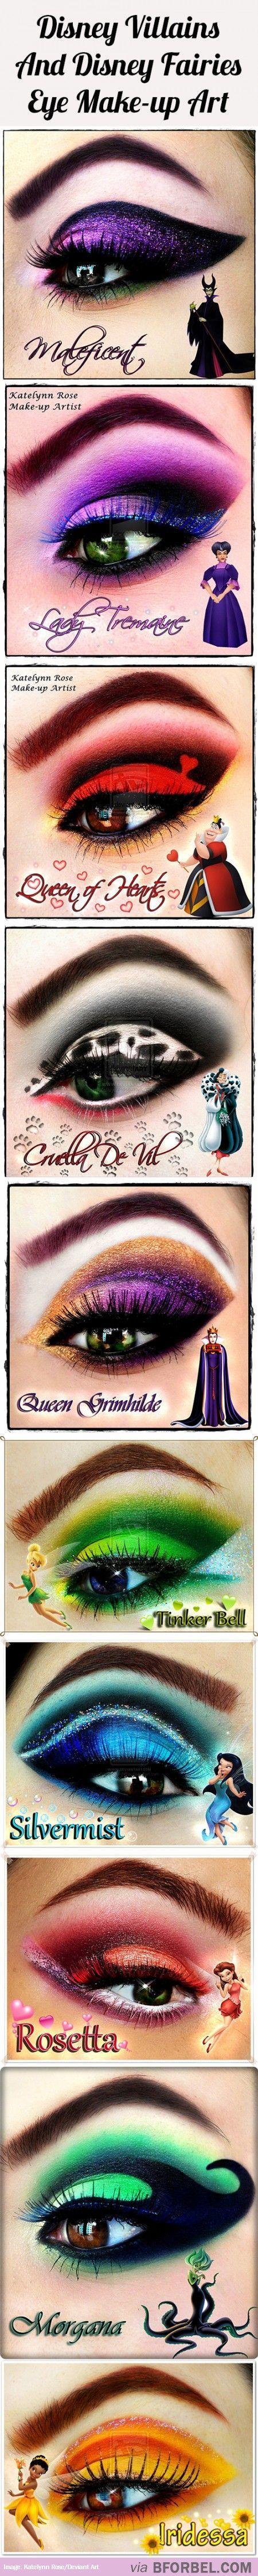 358 besten Art in Makeup Bilder auf Pinterest | Beauty make-up, Make ...